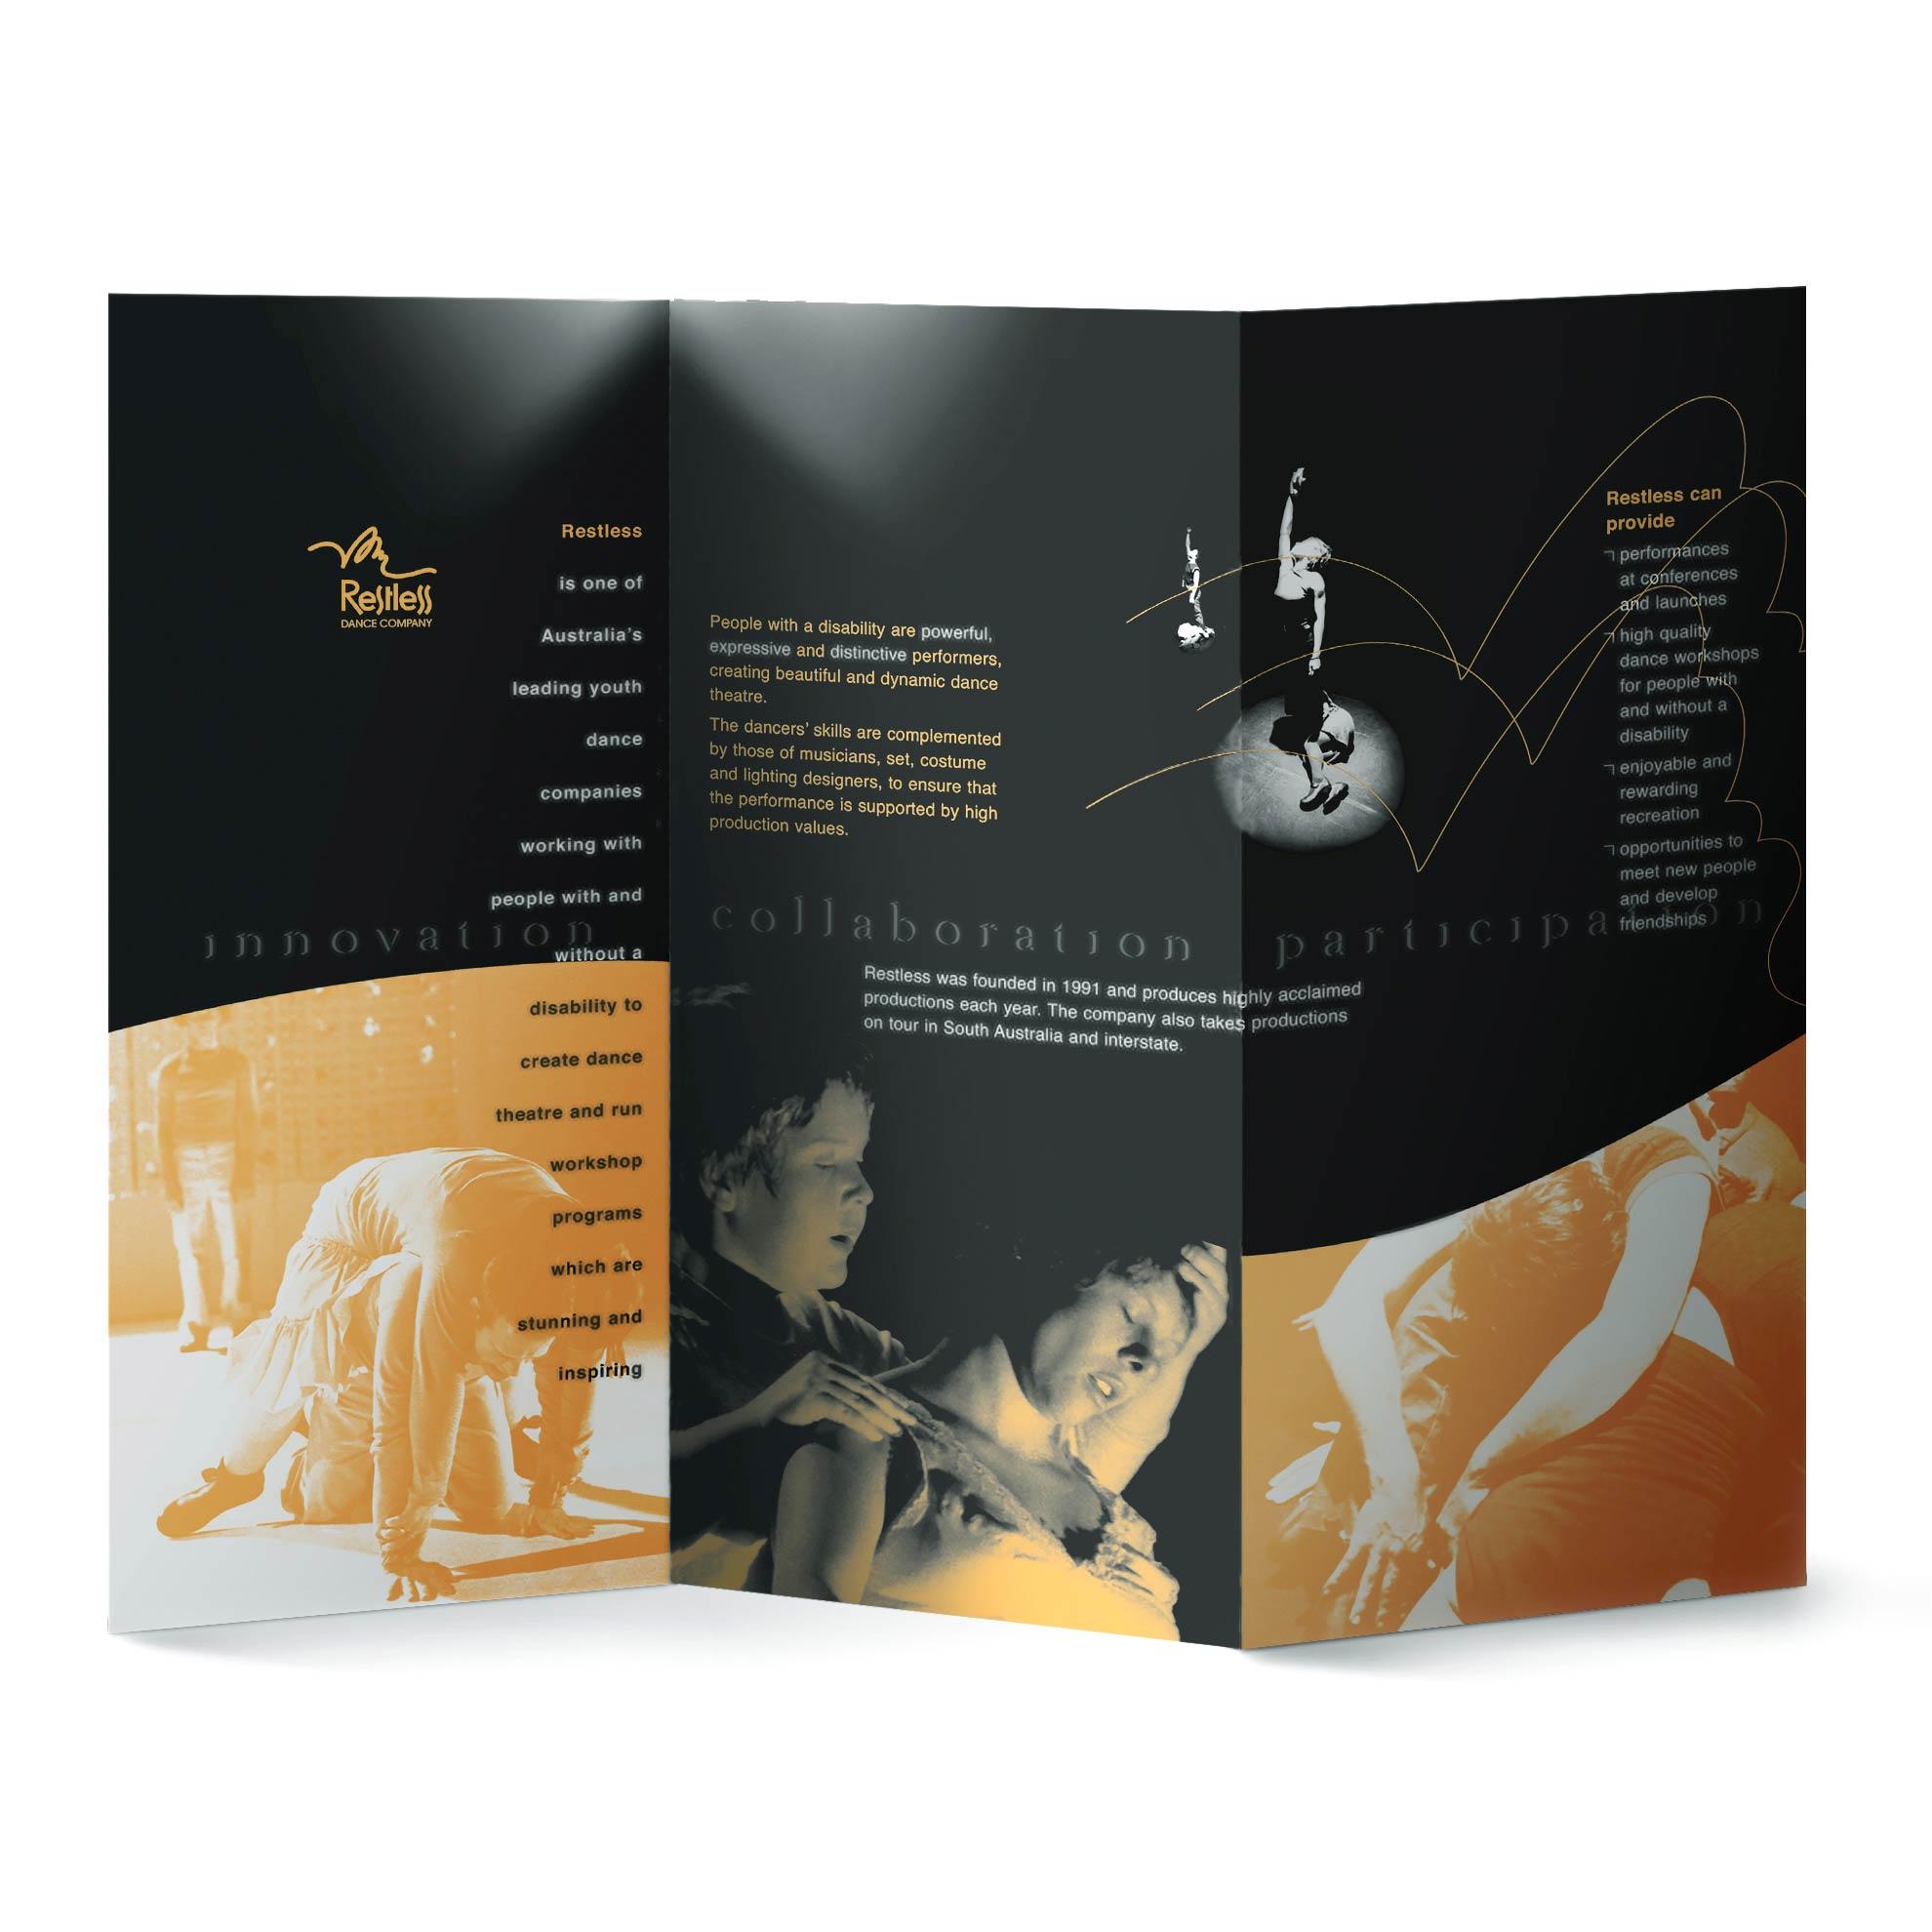 Restless brochure 2